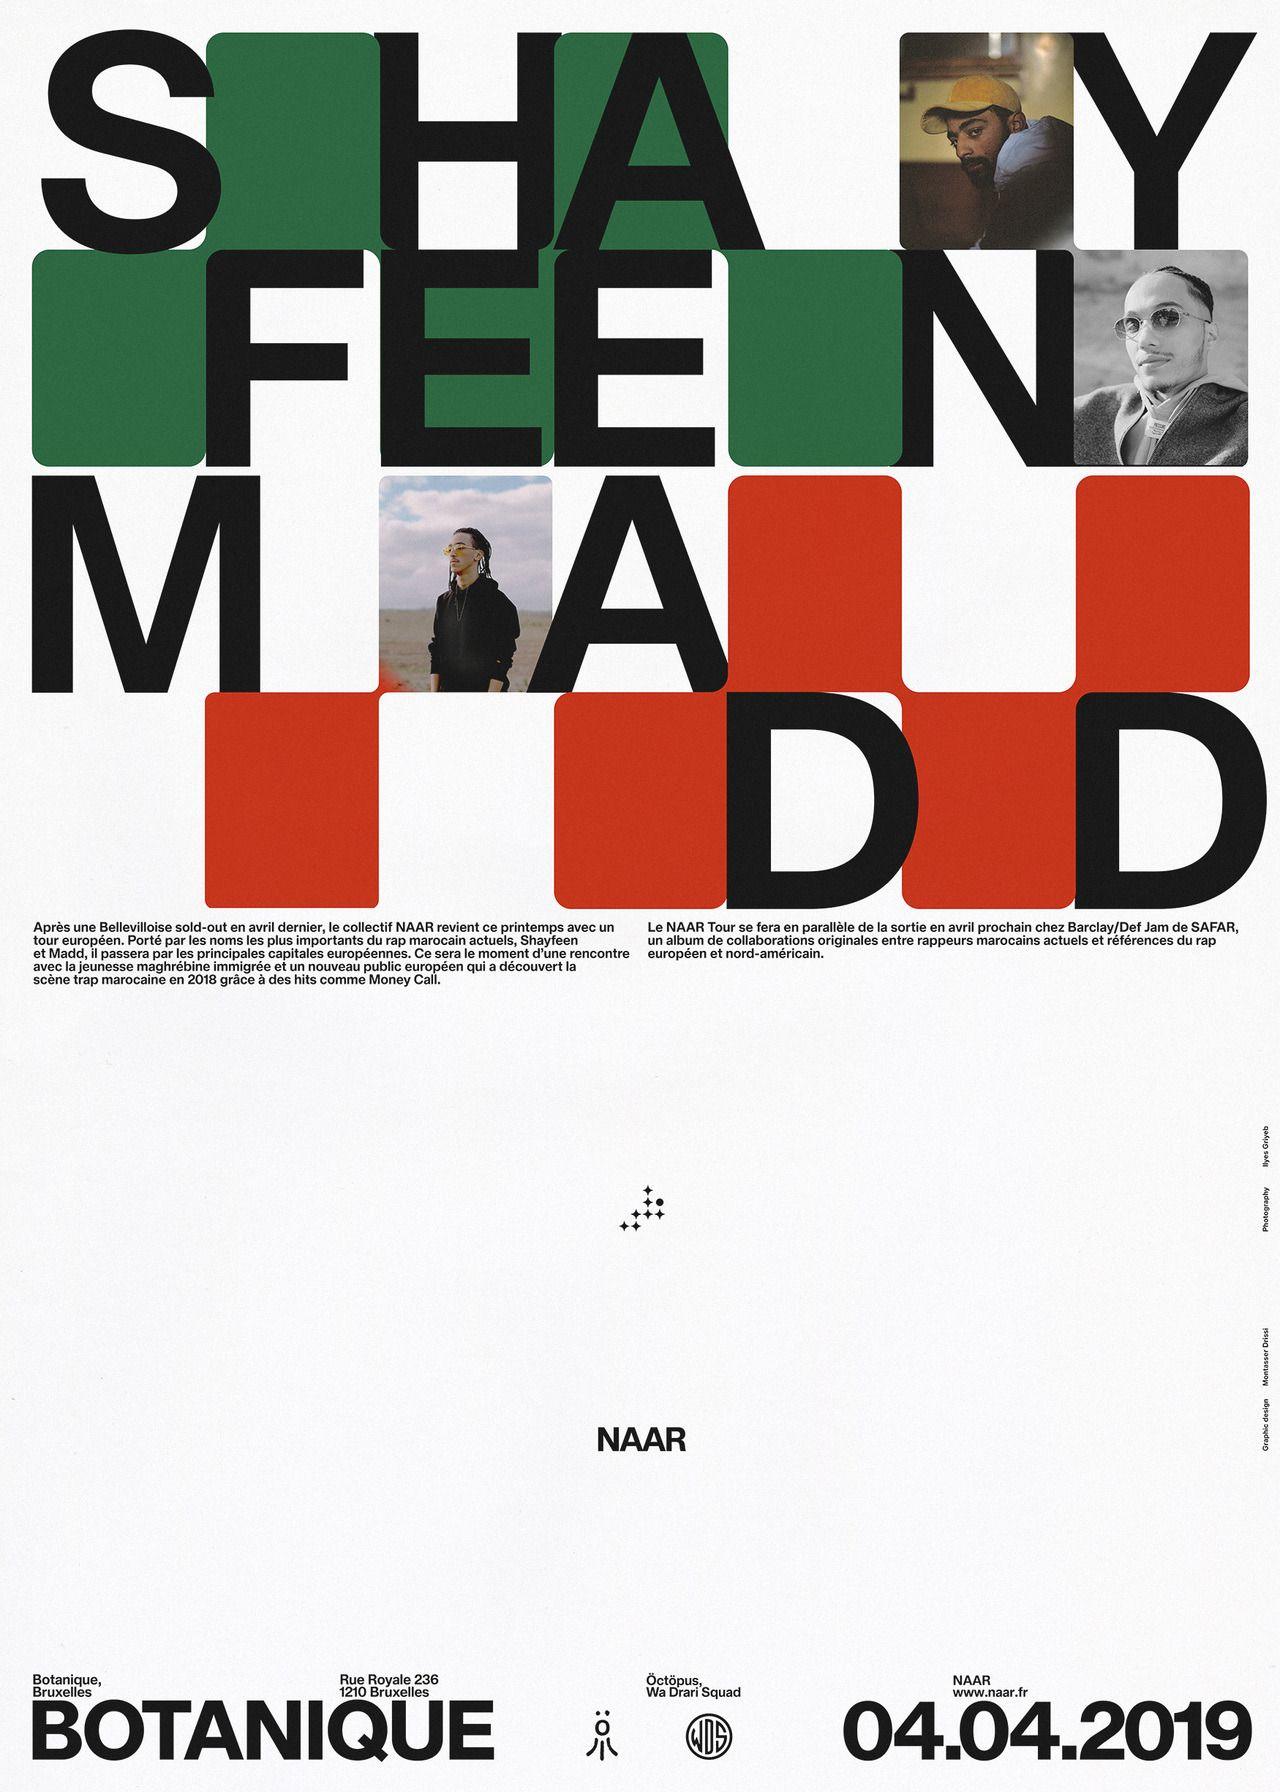 Andren Via Montasserdrissi Naar Poster Trabendo Jpg 1750 2450 Graphics Thisisgrey Likes Typography Graphic Poster Graphic Design